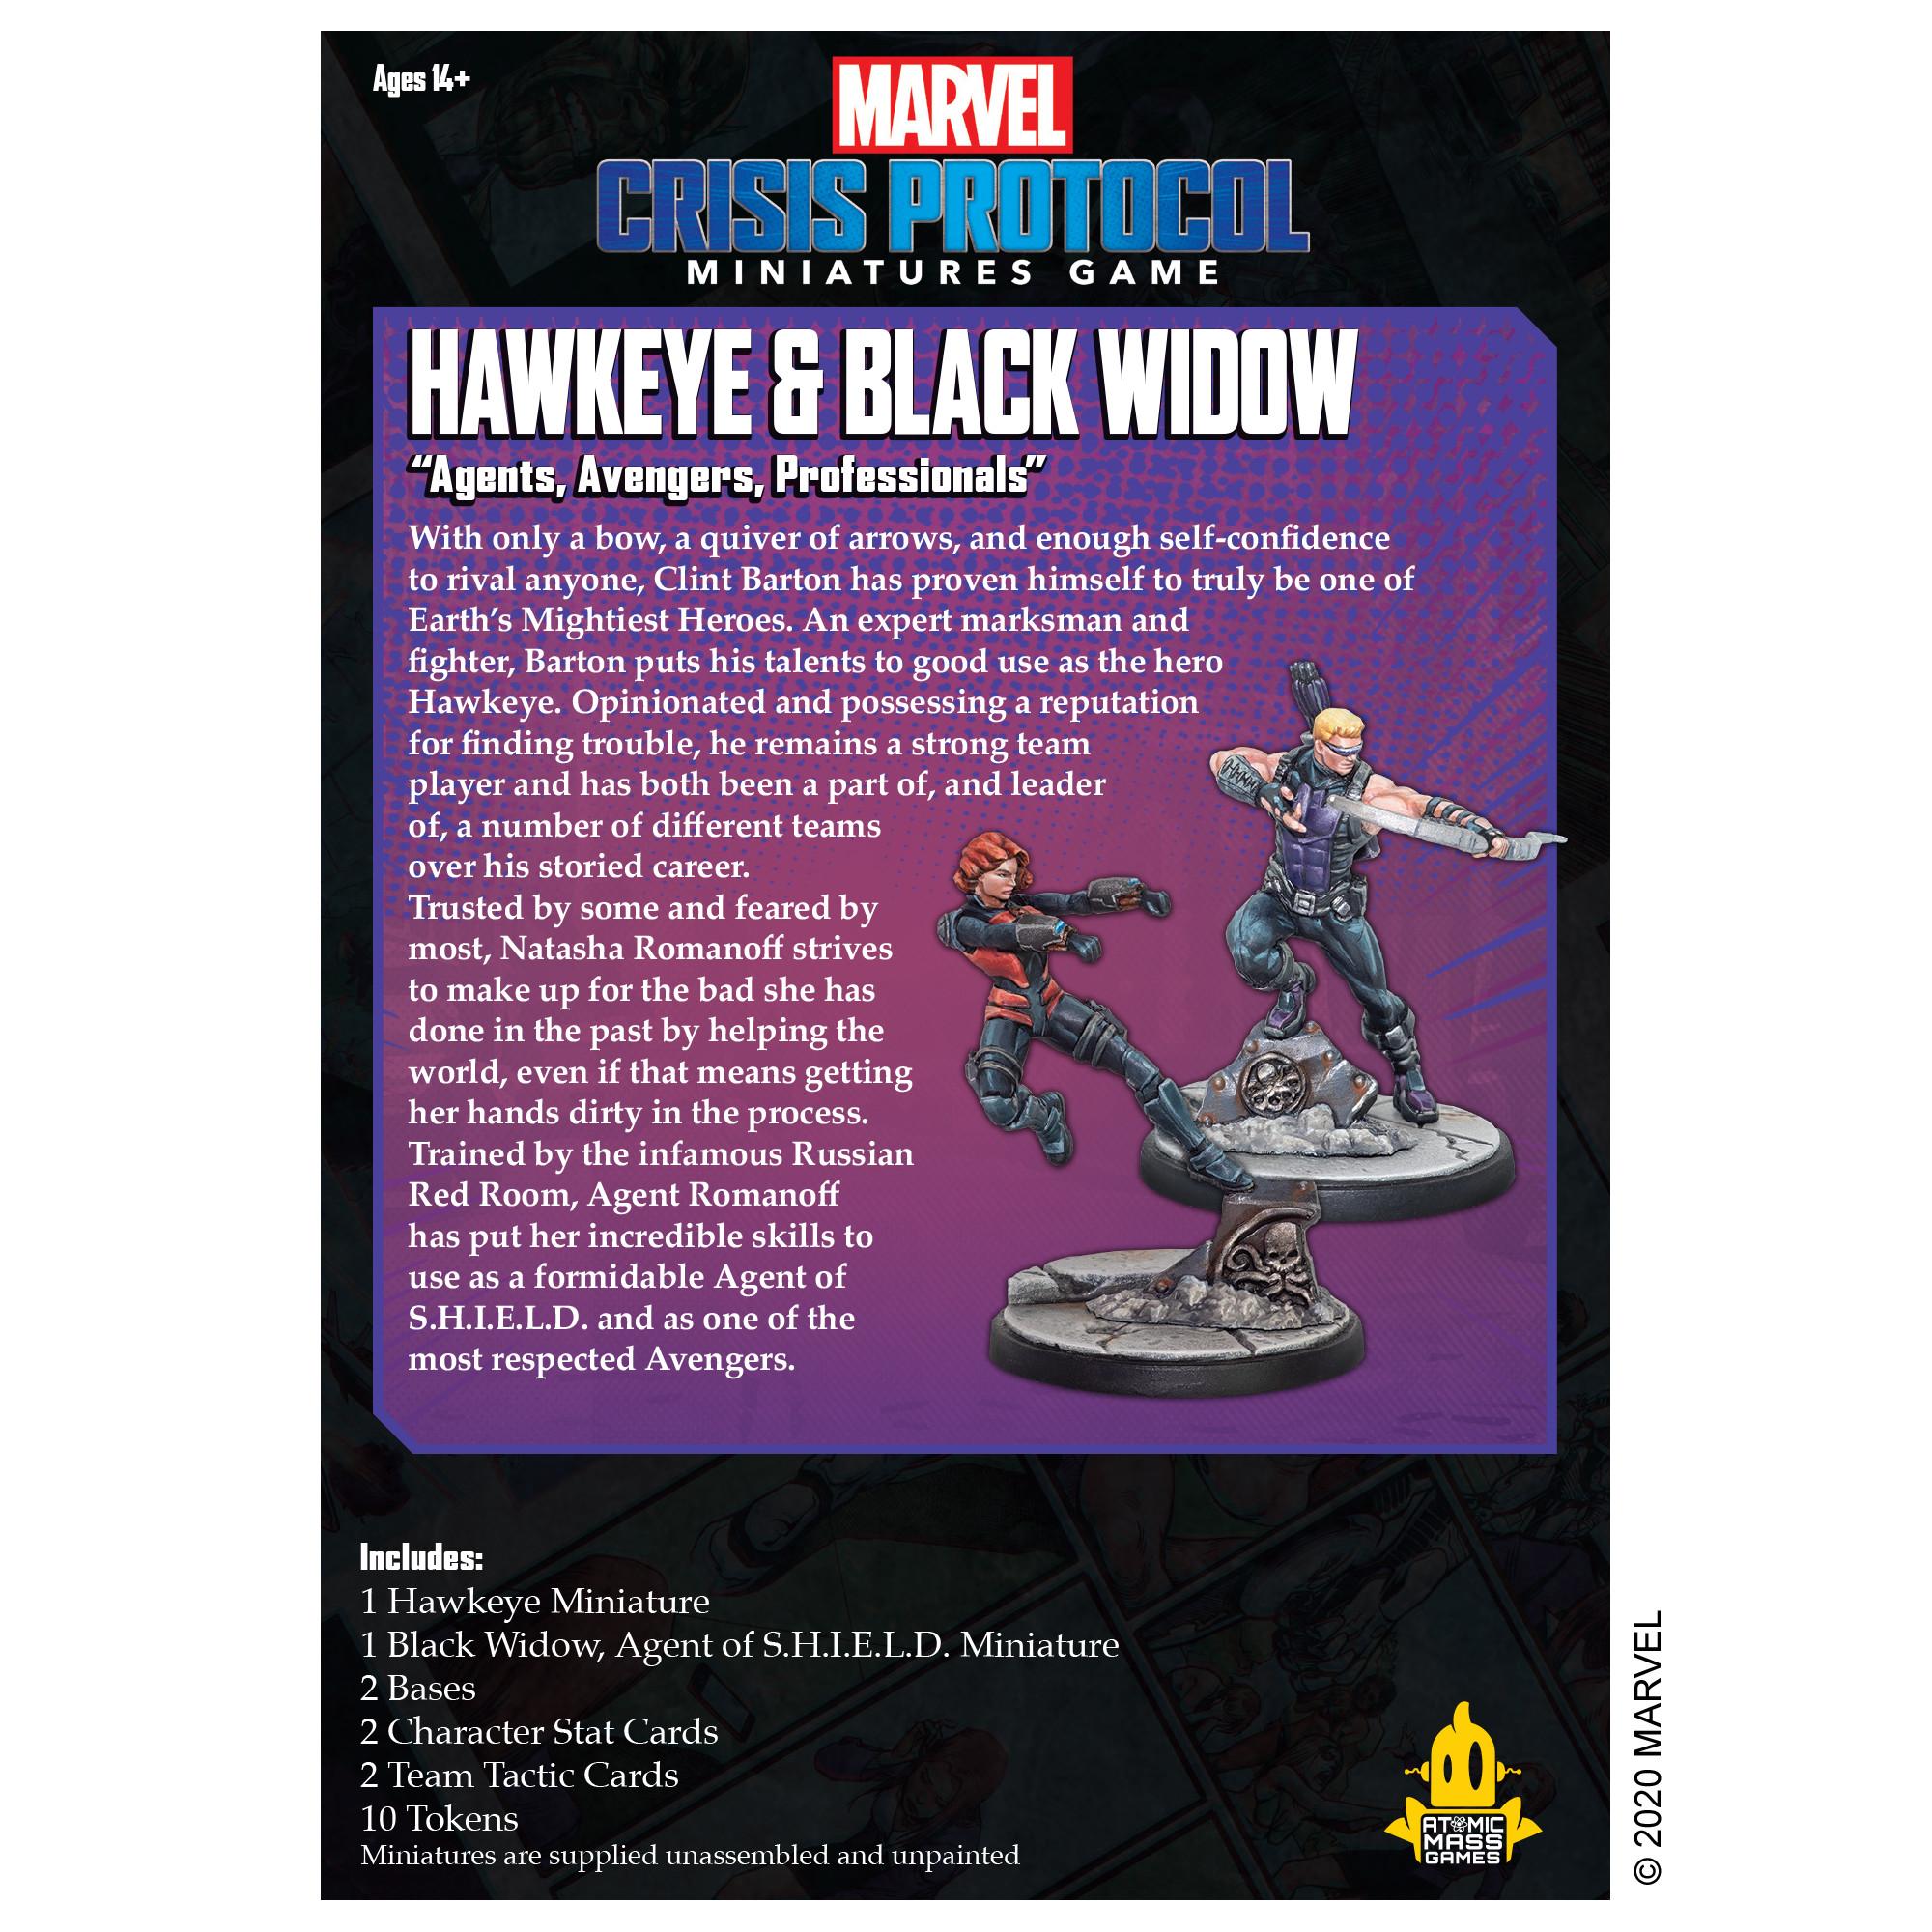 Marvel Crisis Protocol: Hawkeye & Black Widow